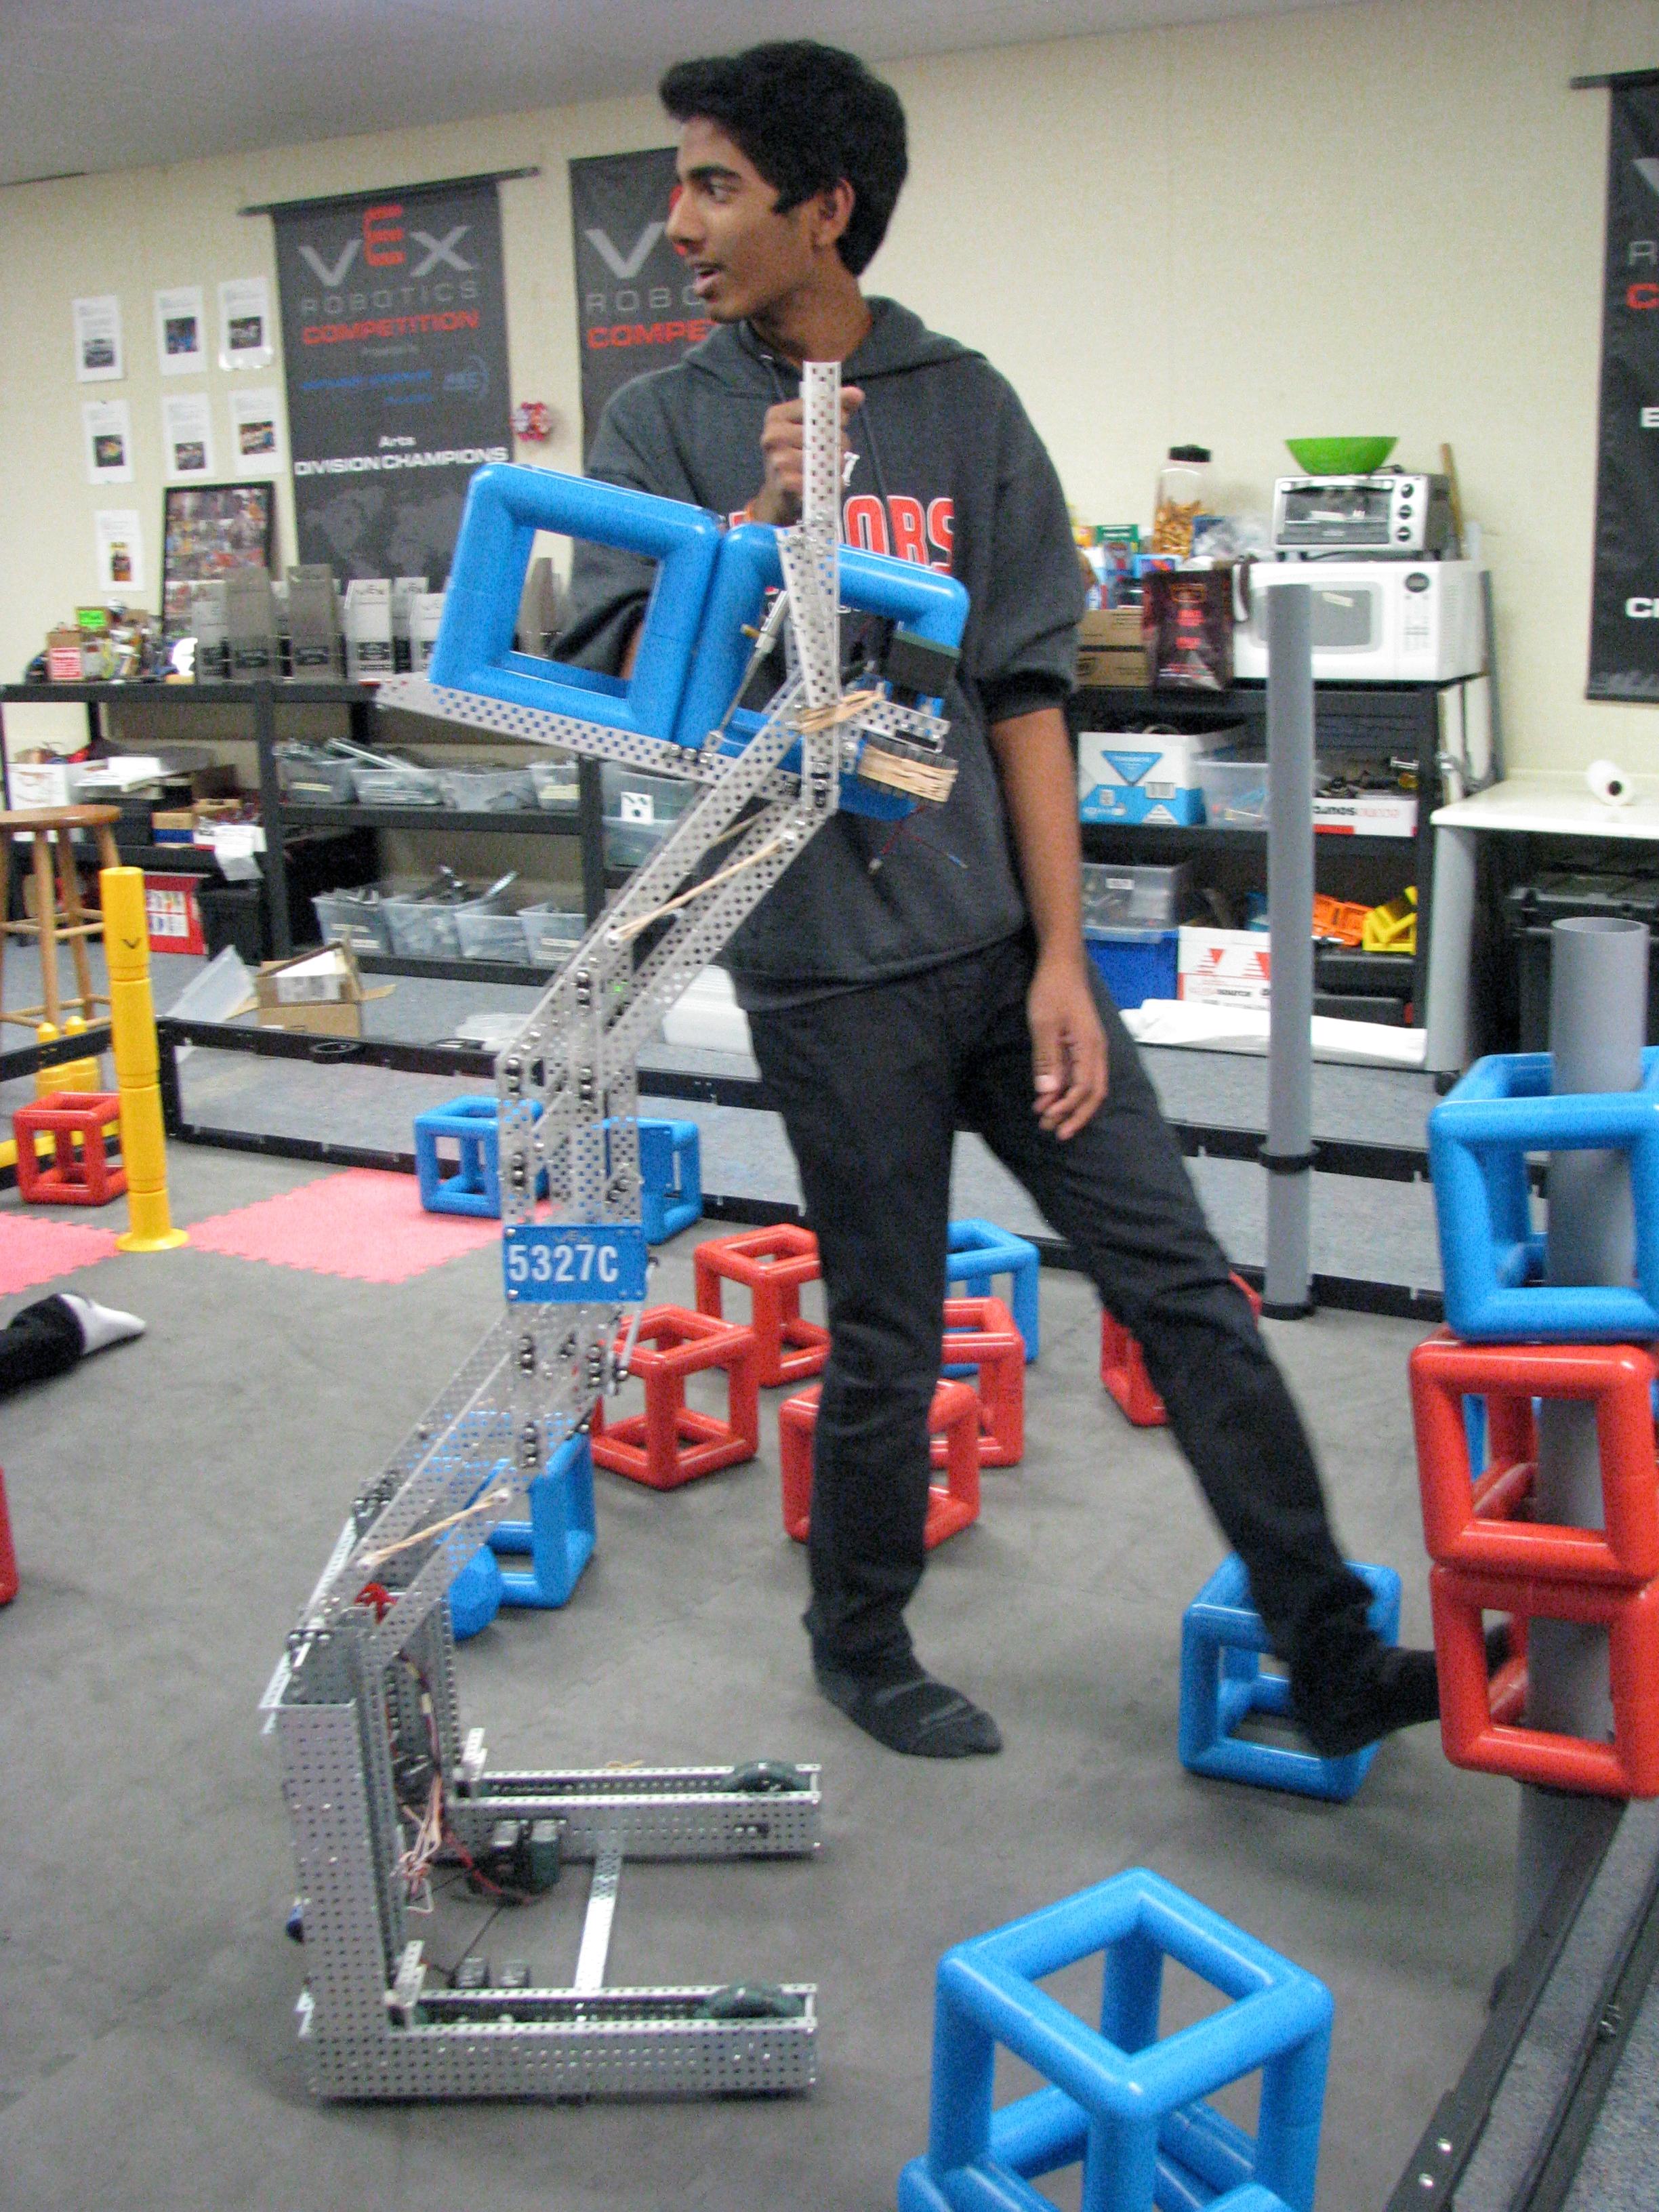 Dublin High School Robotics Club 1 Onedublin Org